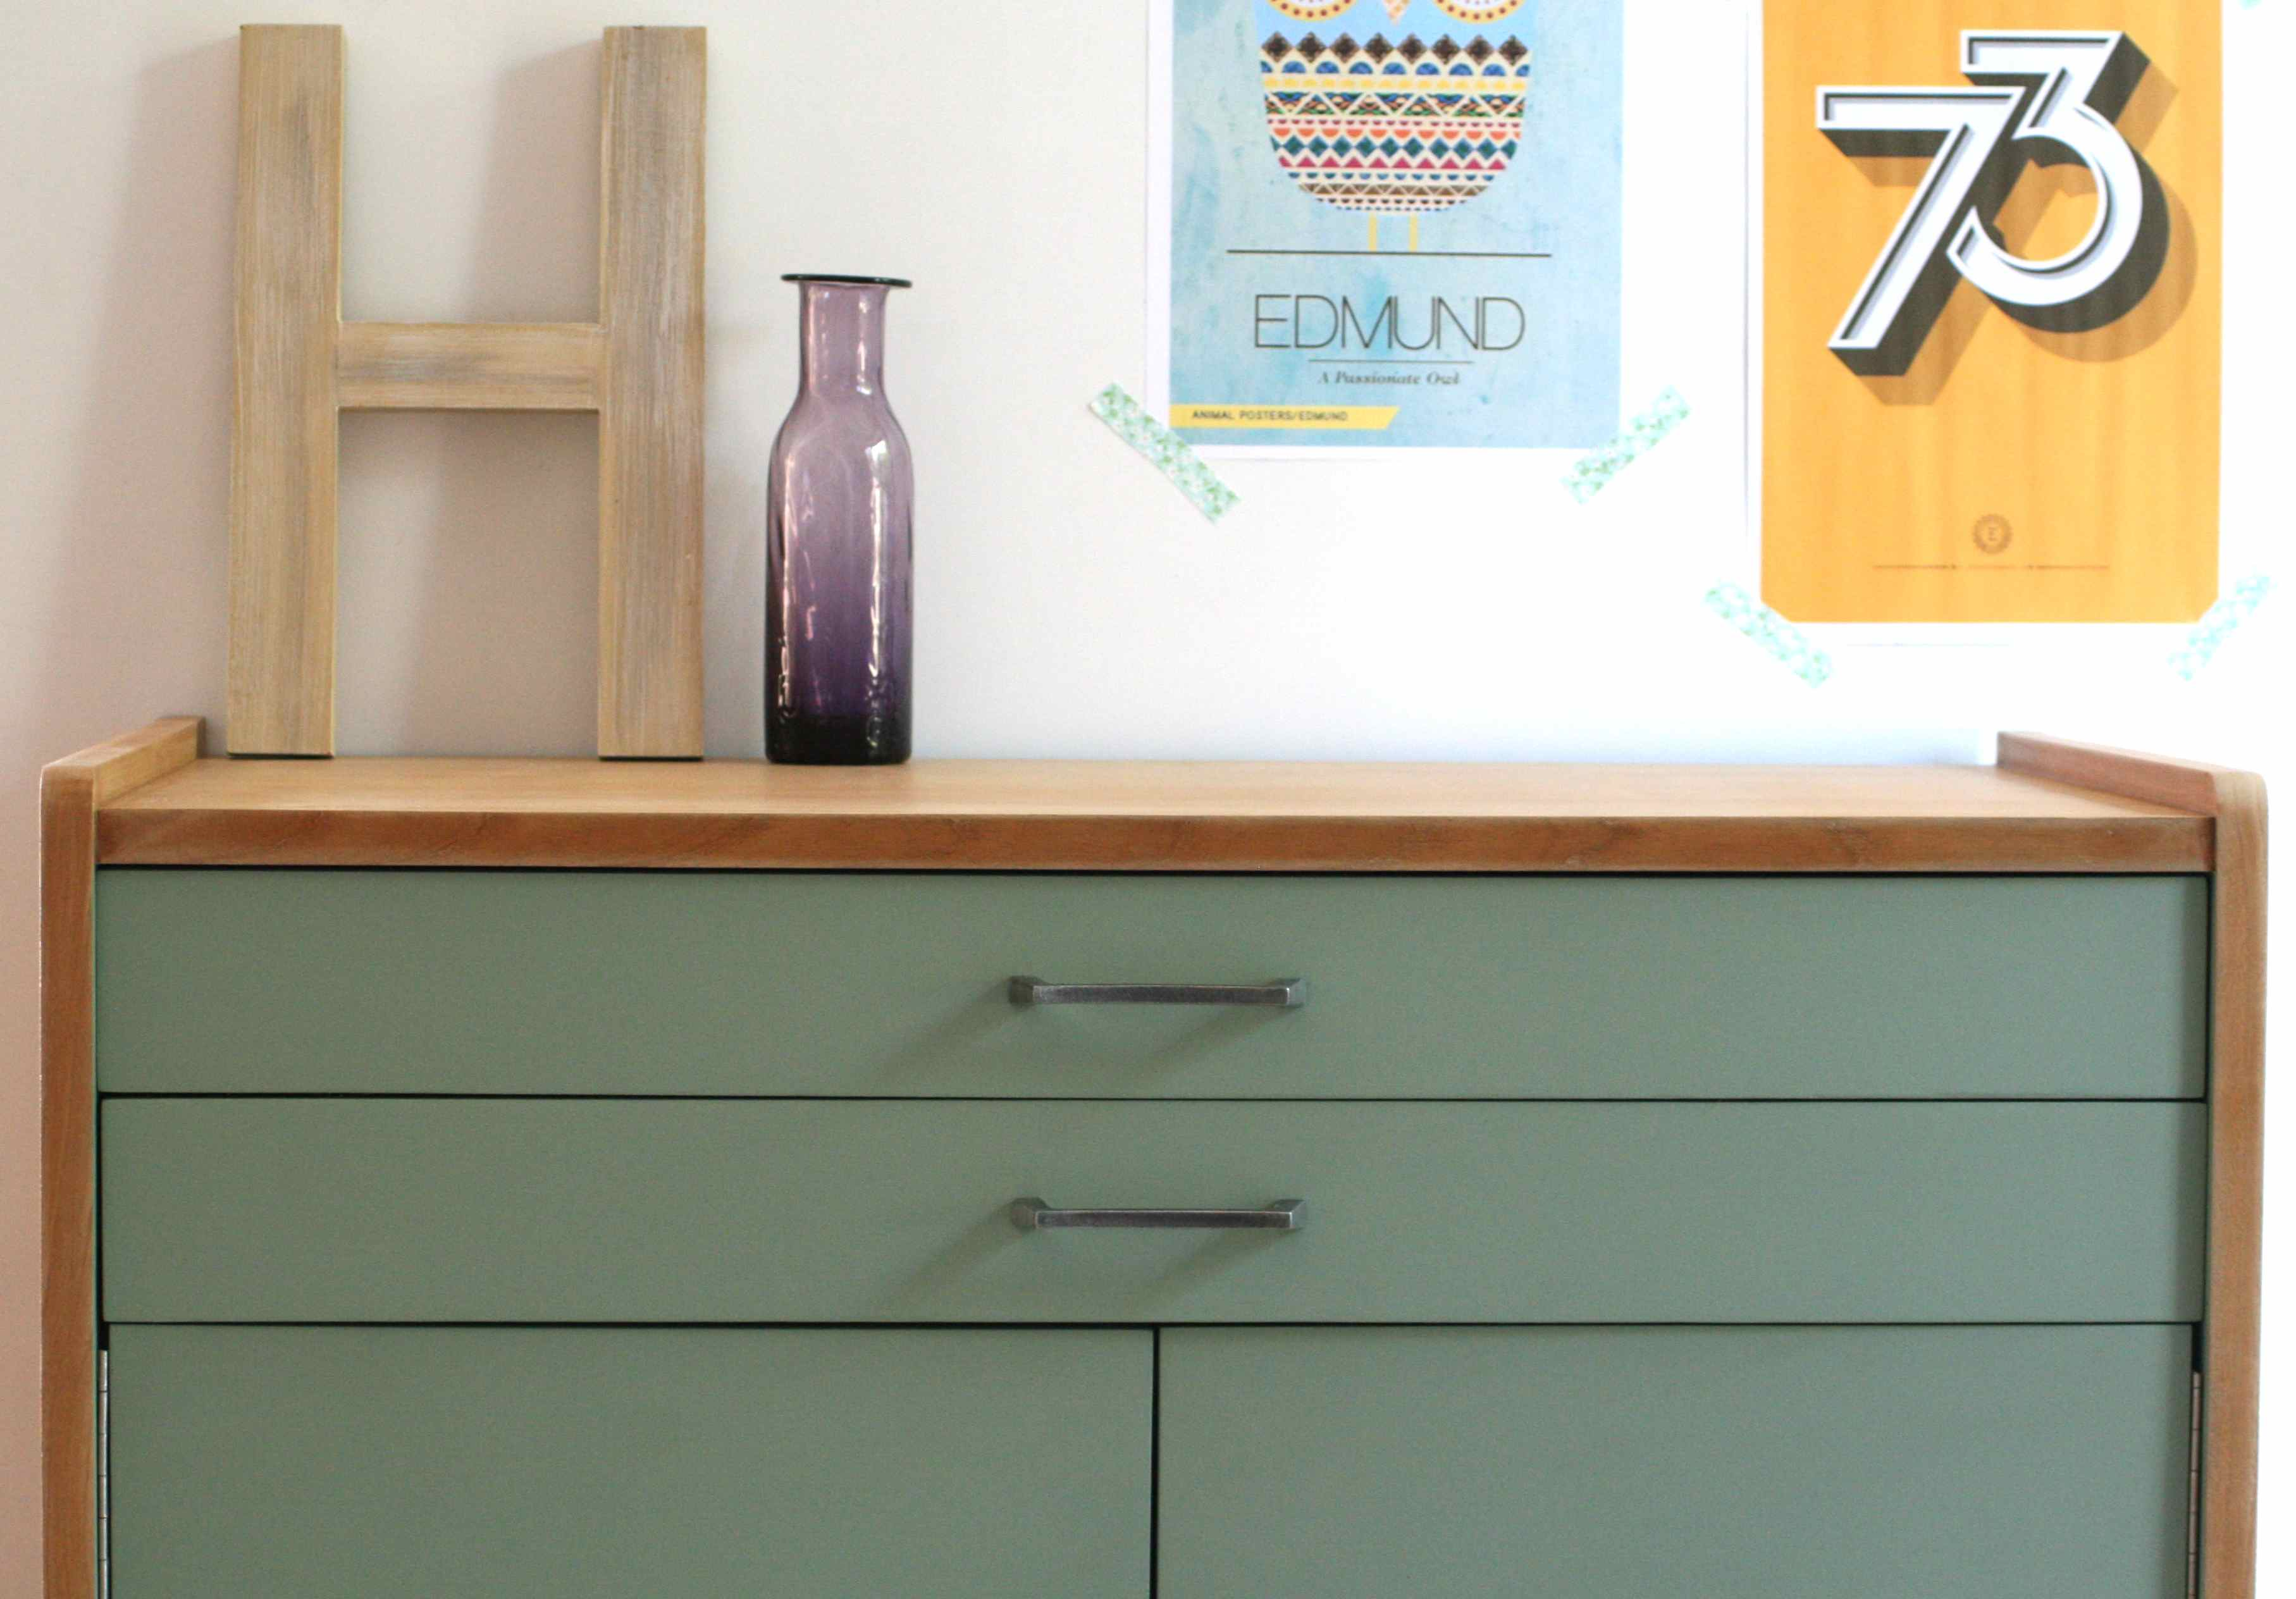 Meuble rangement teender green les jolis meubles for Commande meubles concept